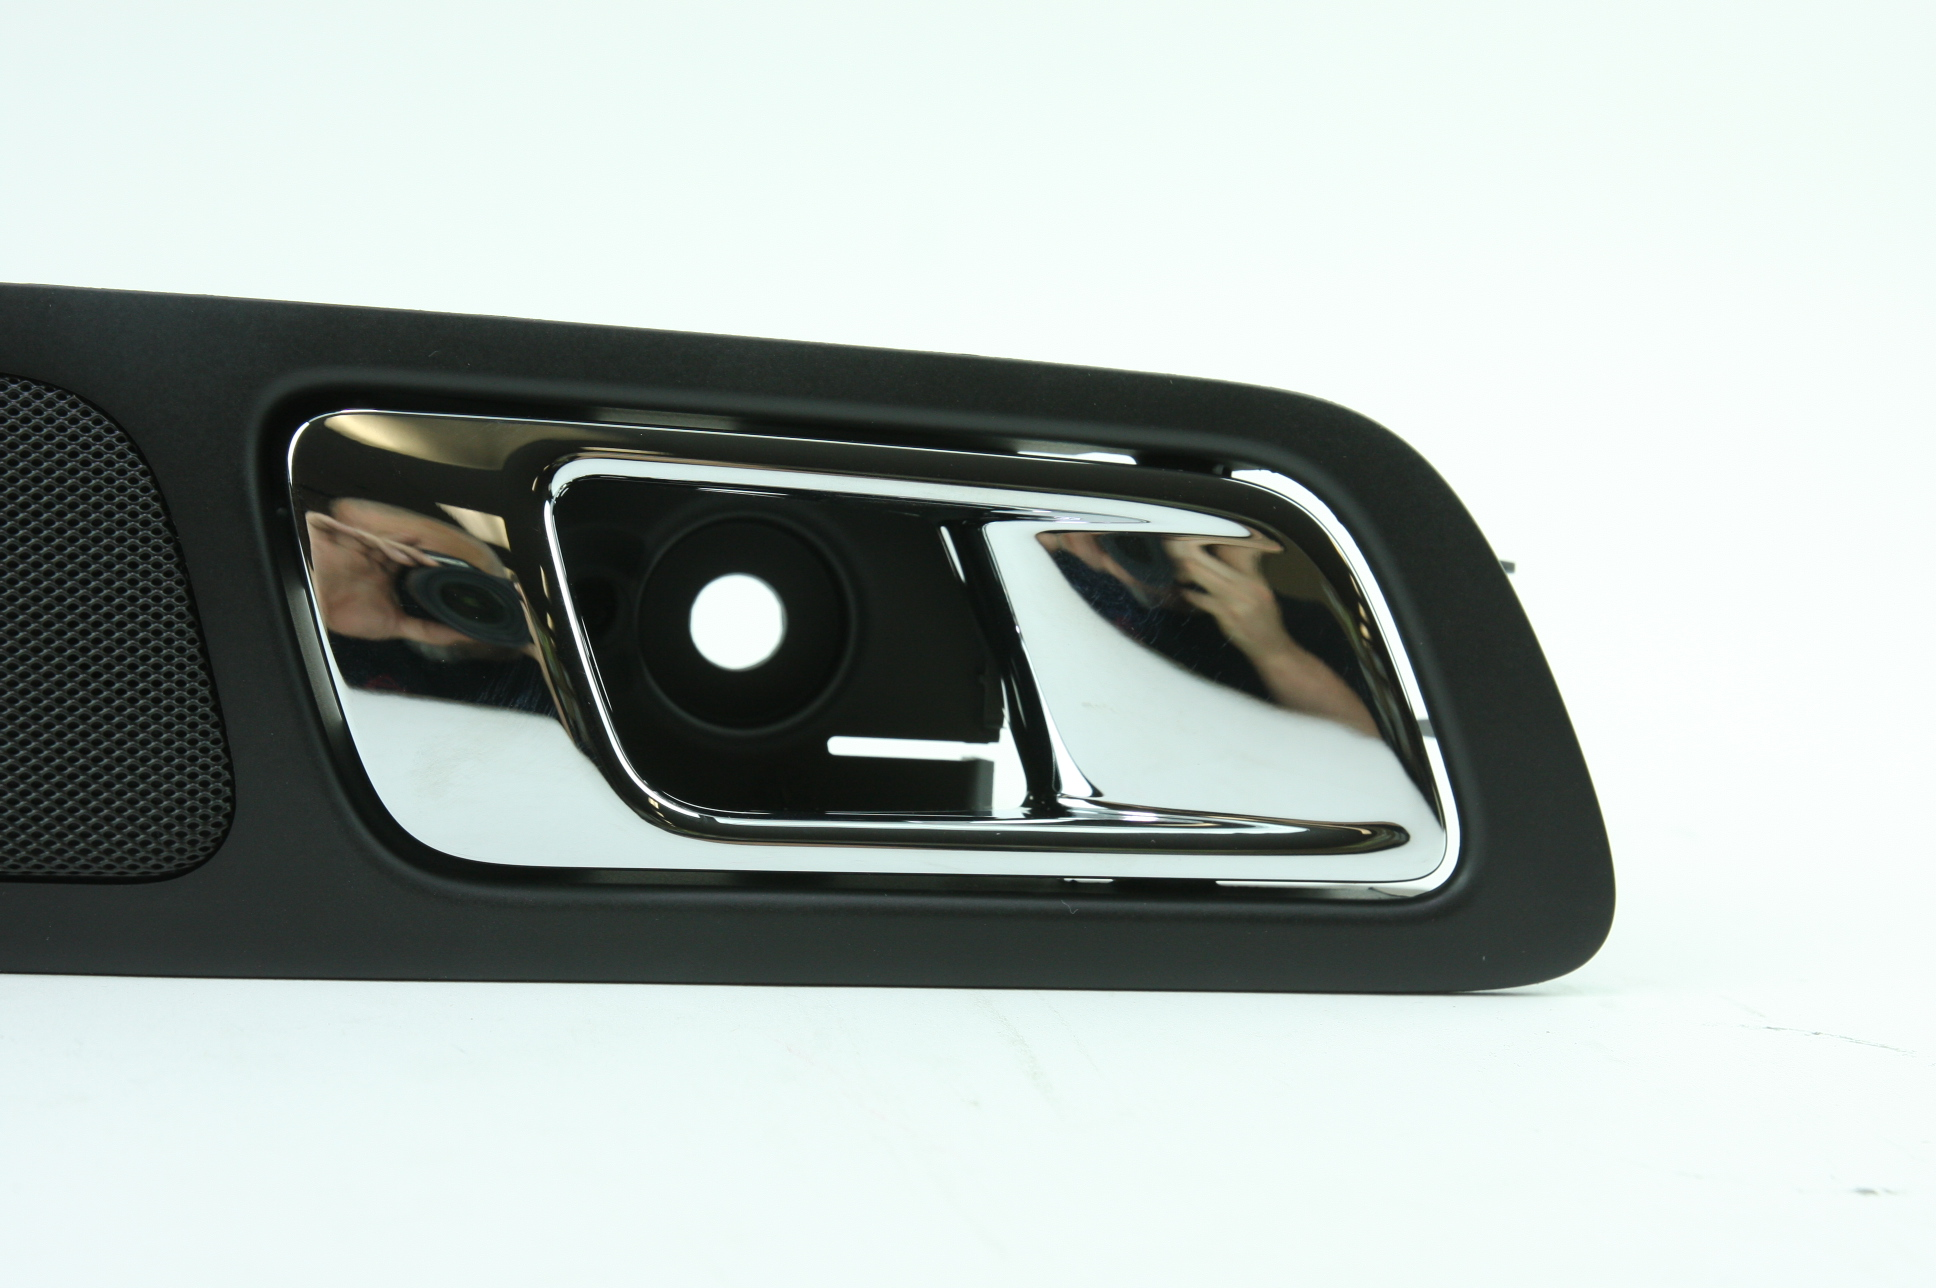 **** New Genuine OEM EB5Z7822600AB Ford RH Passenger Inside Door Handle Explorer - image 4